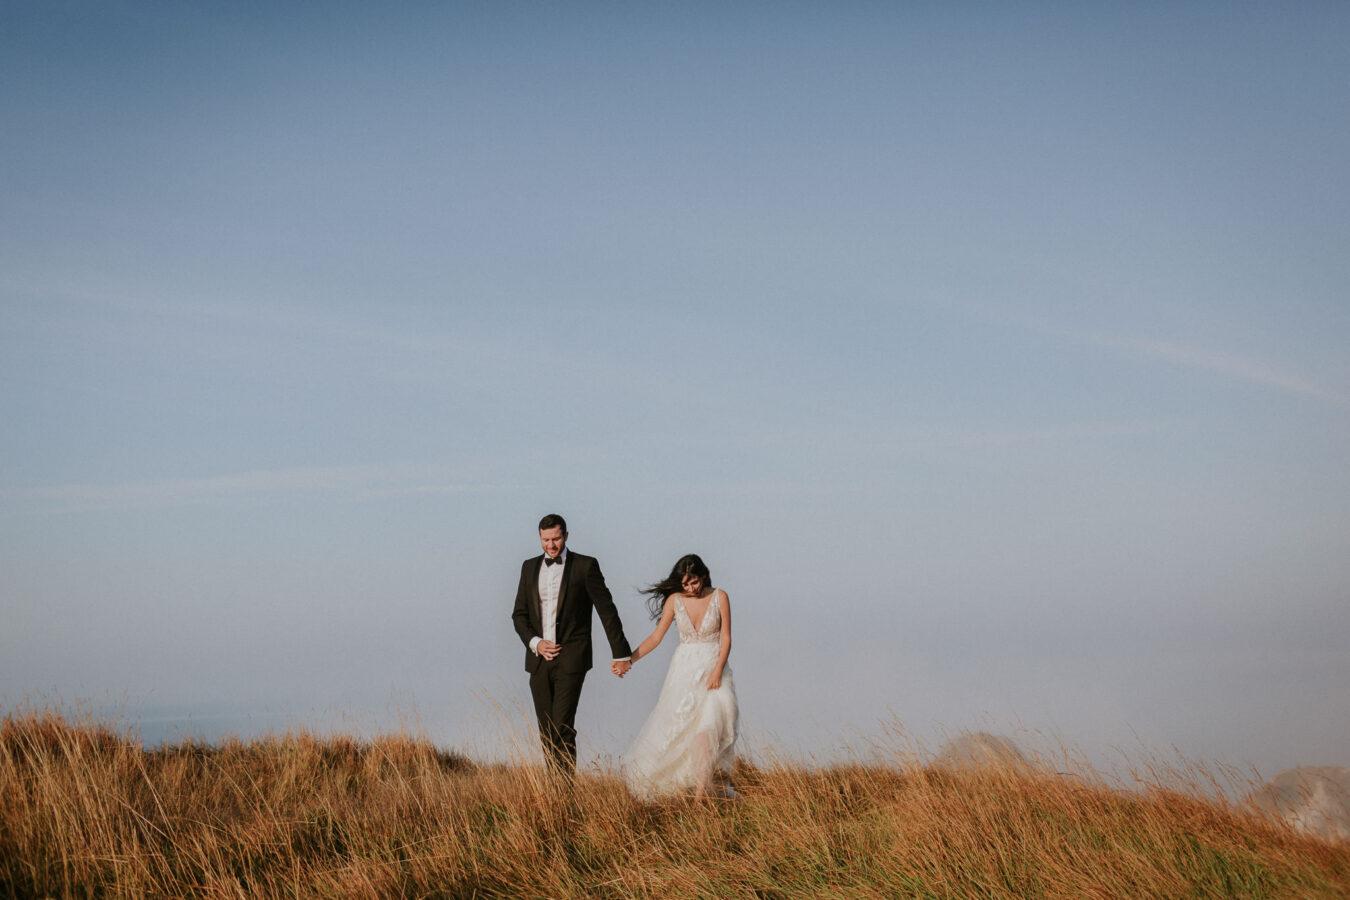 Dorset Elopement Photography | Nofar & Jonny